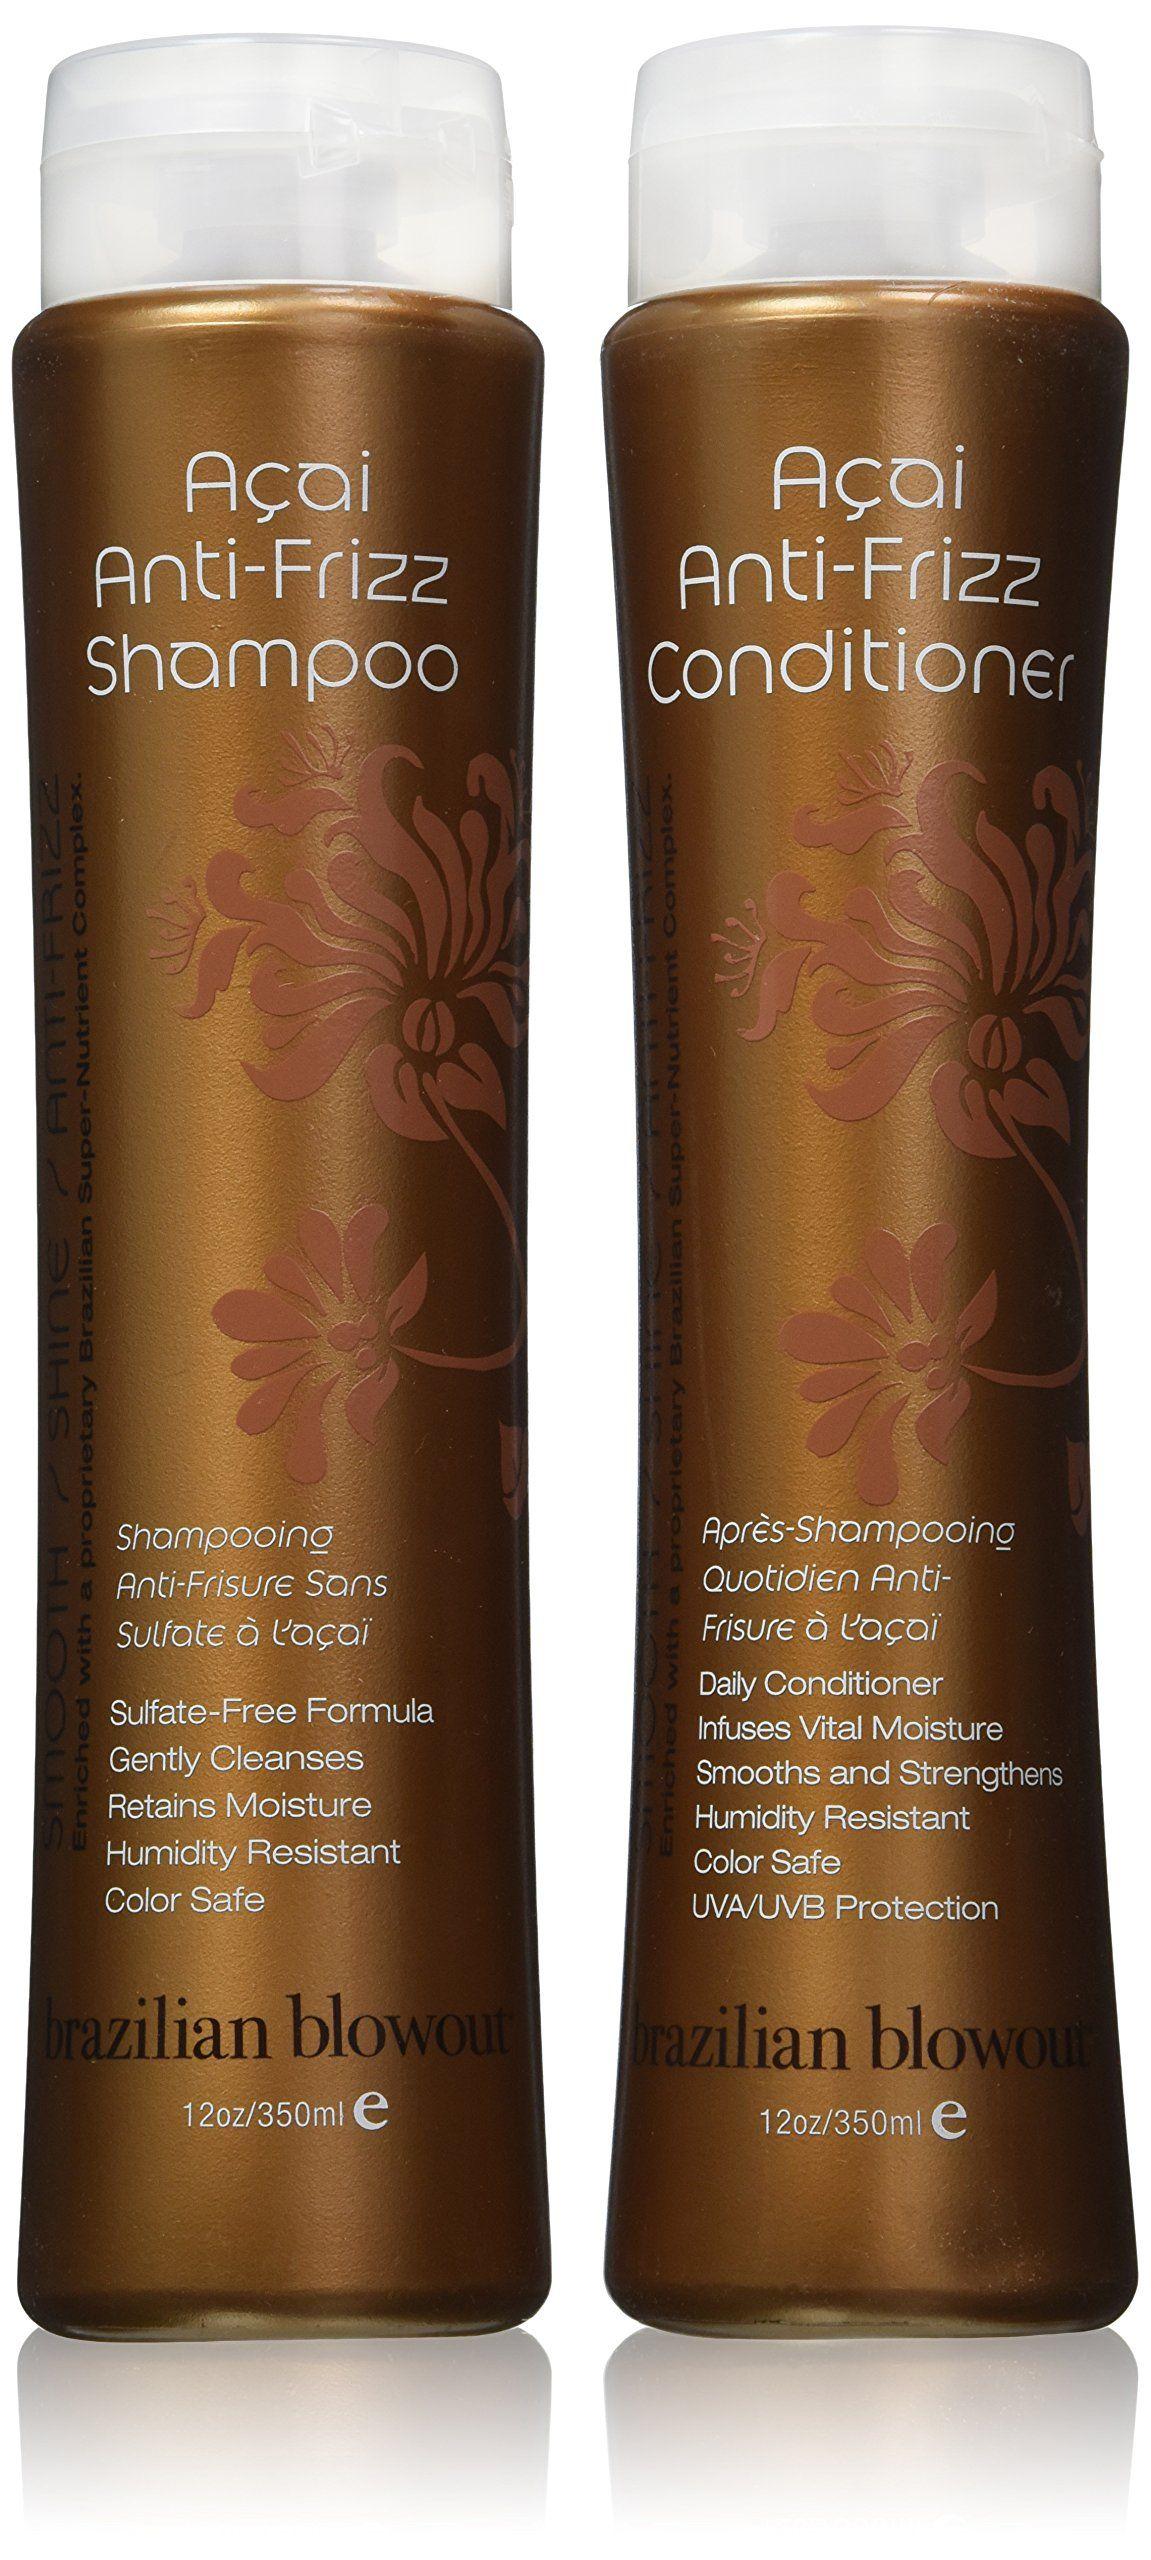 Brazilian Blowout Anti Frizz Shampoo Conditioner 12 Ounce Bottles